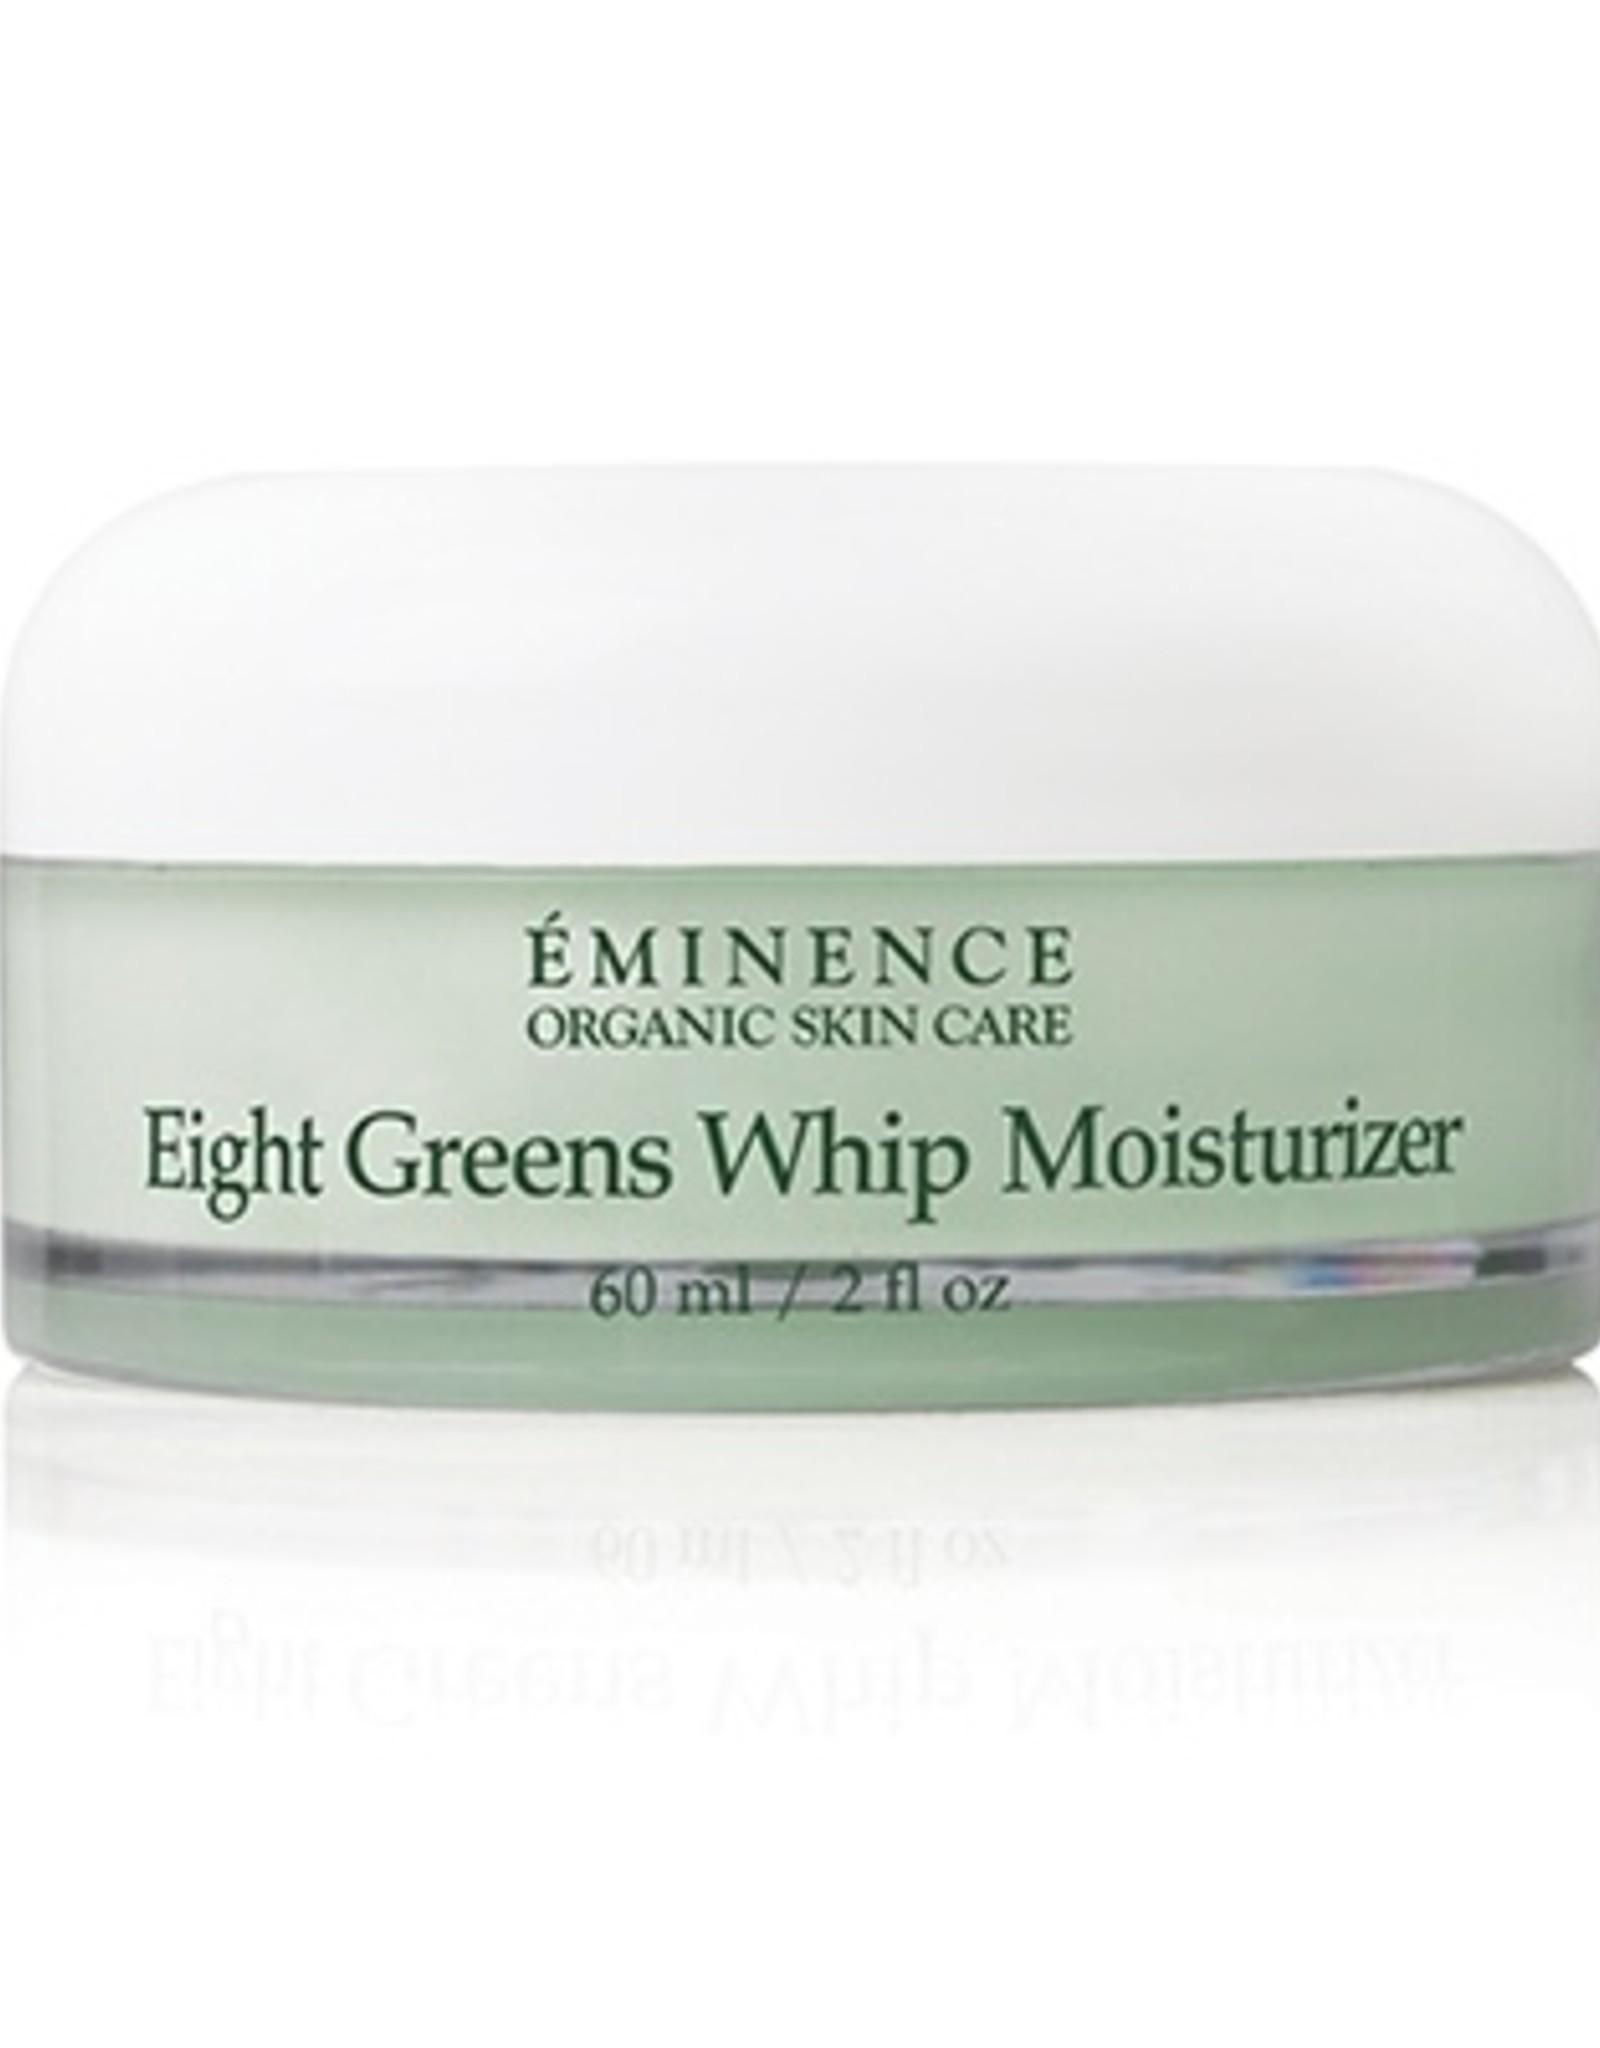 Eminence Organic Skin Care Eight Greens Whip Moisturizer